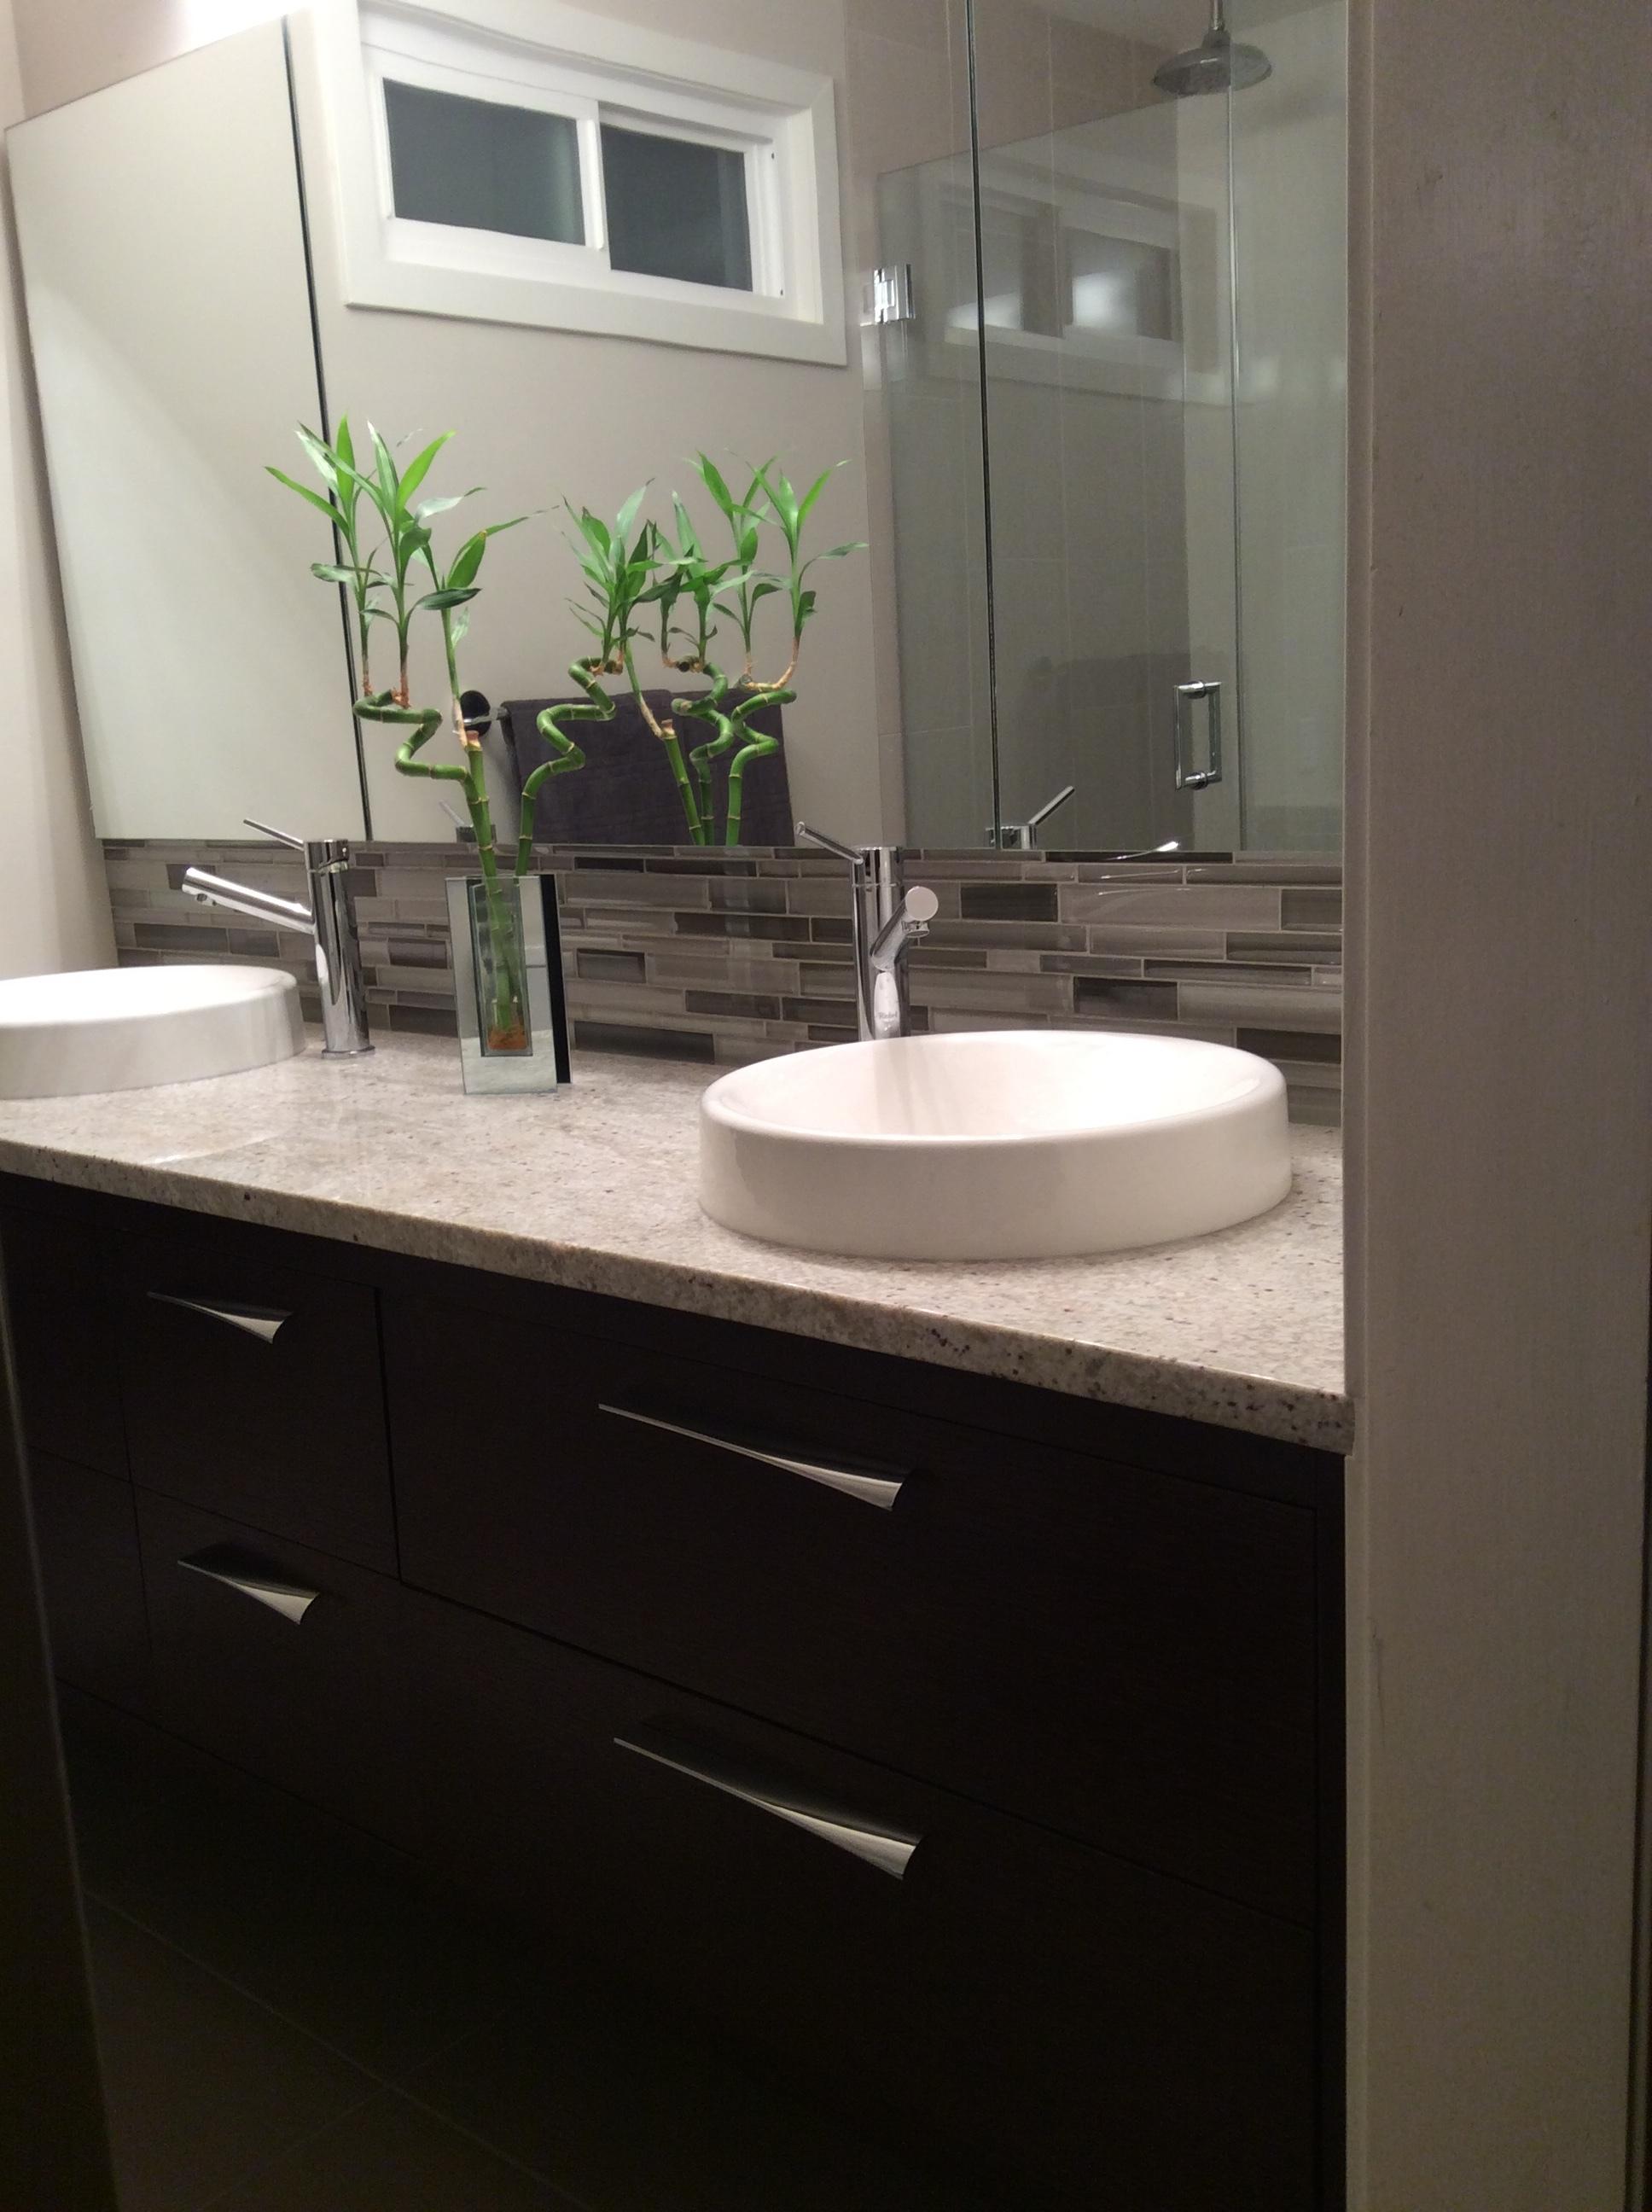 Custom quarter sawn oak cabinetry, granite countertops, round porcelain sinks, glass backsplash.